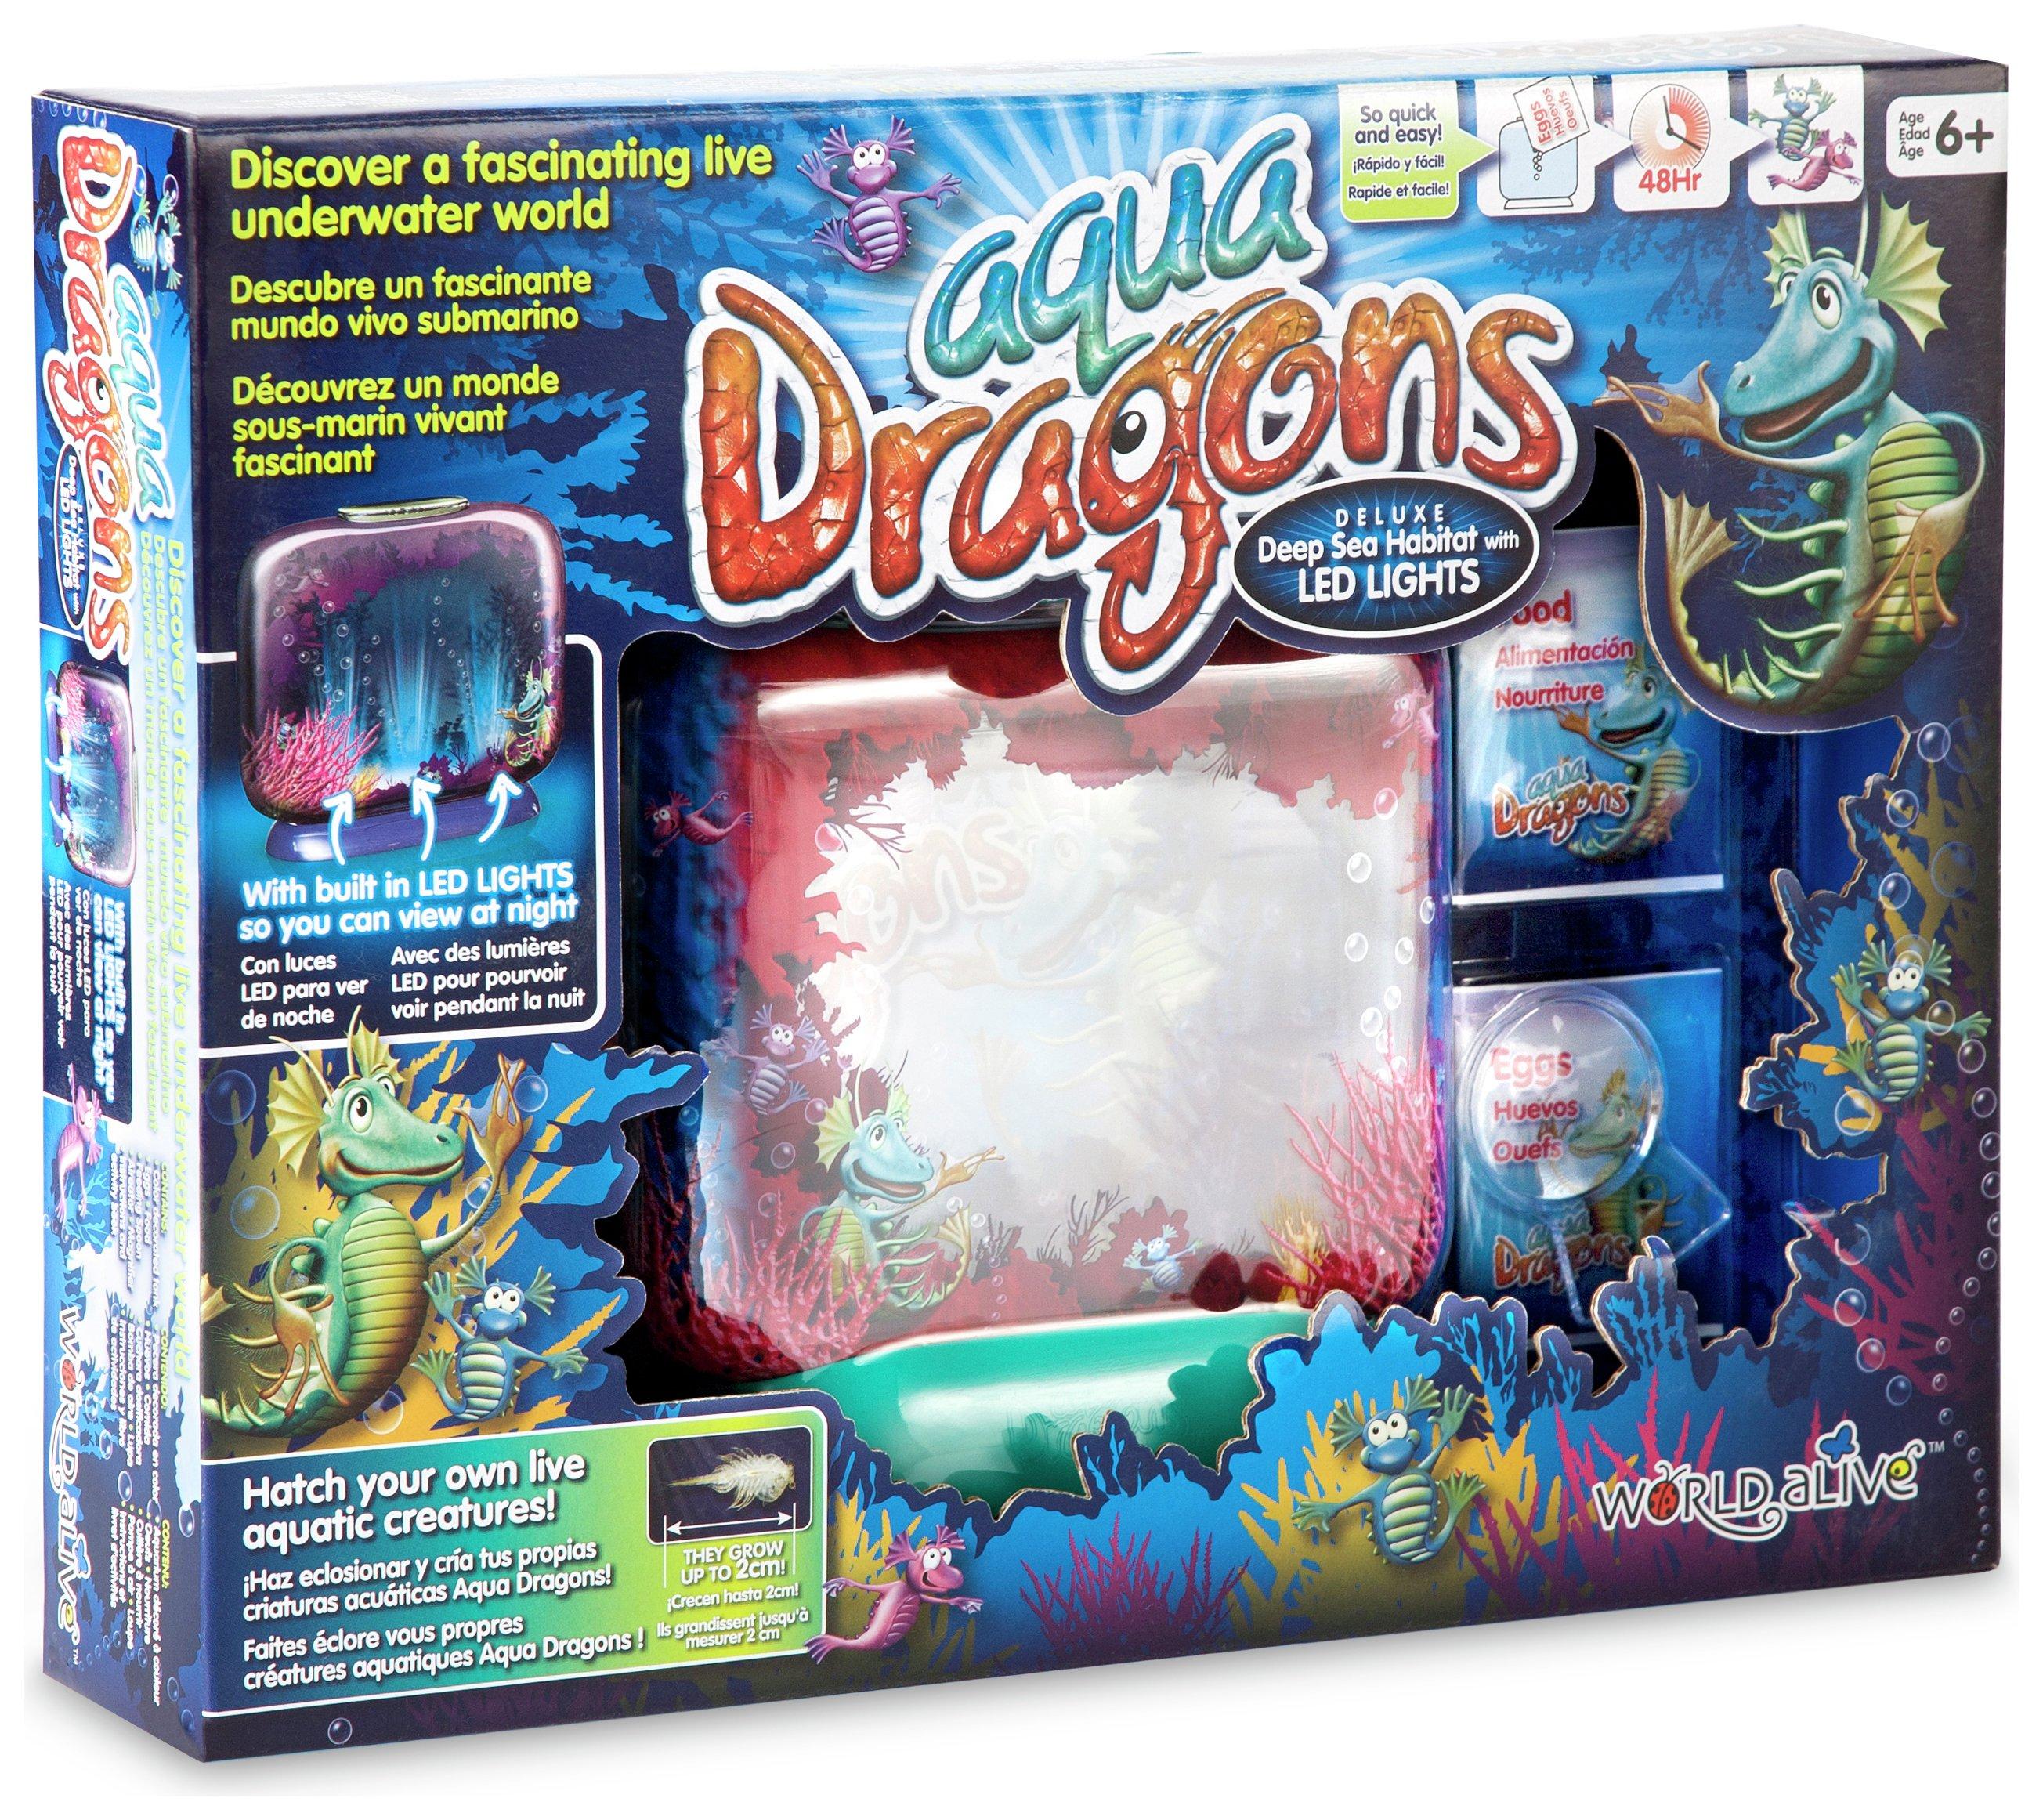 Image of Aqua Dragons Deluxe Playset.